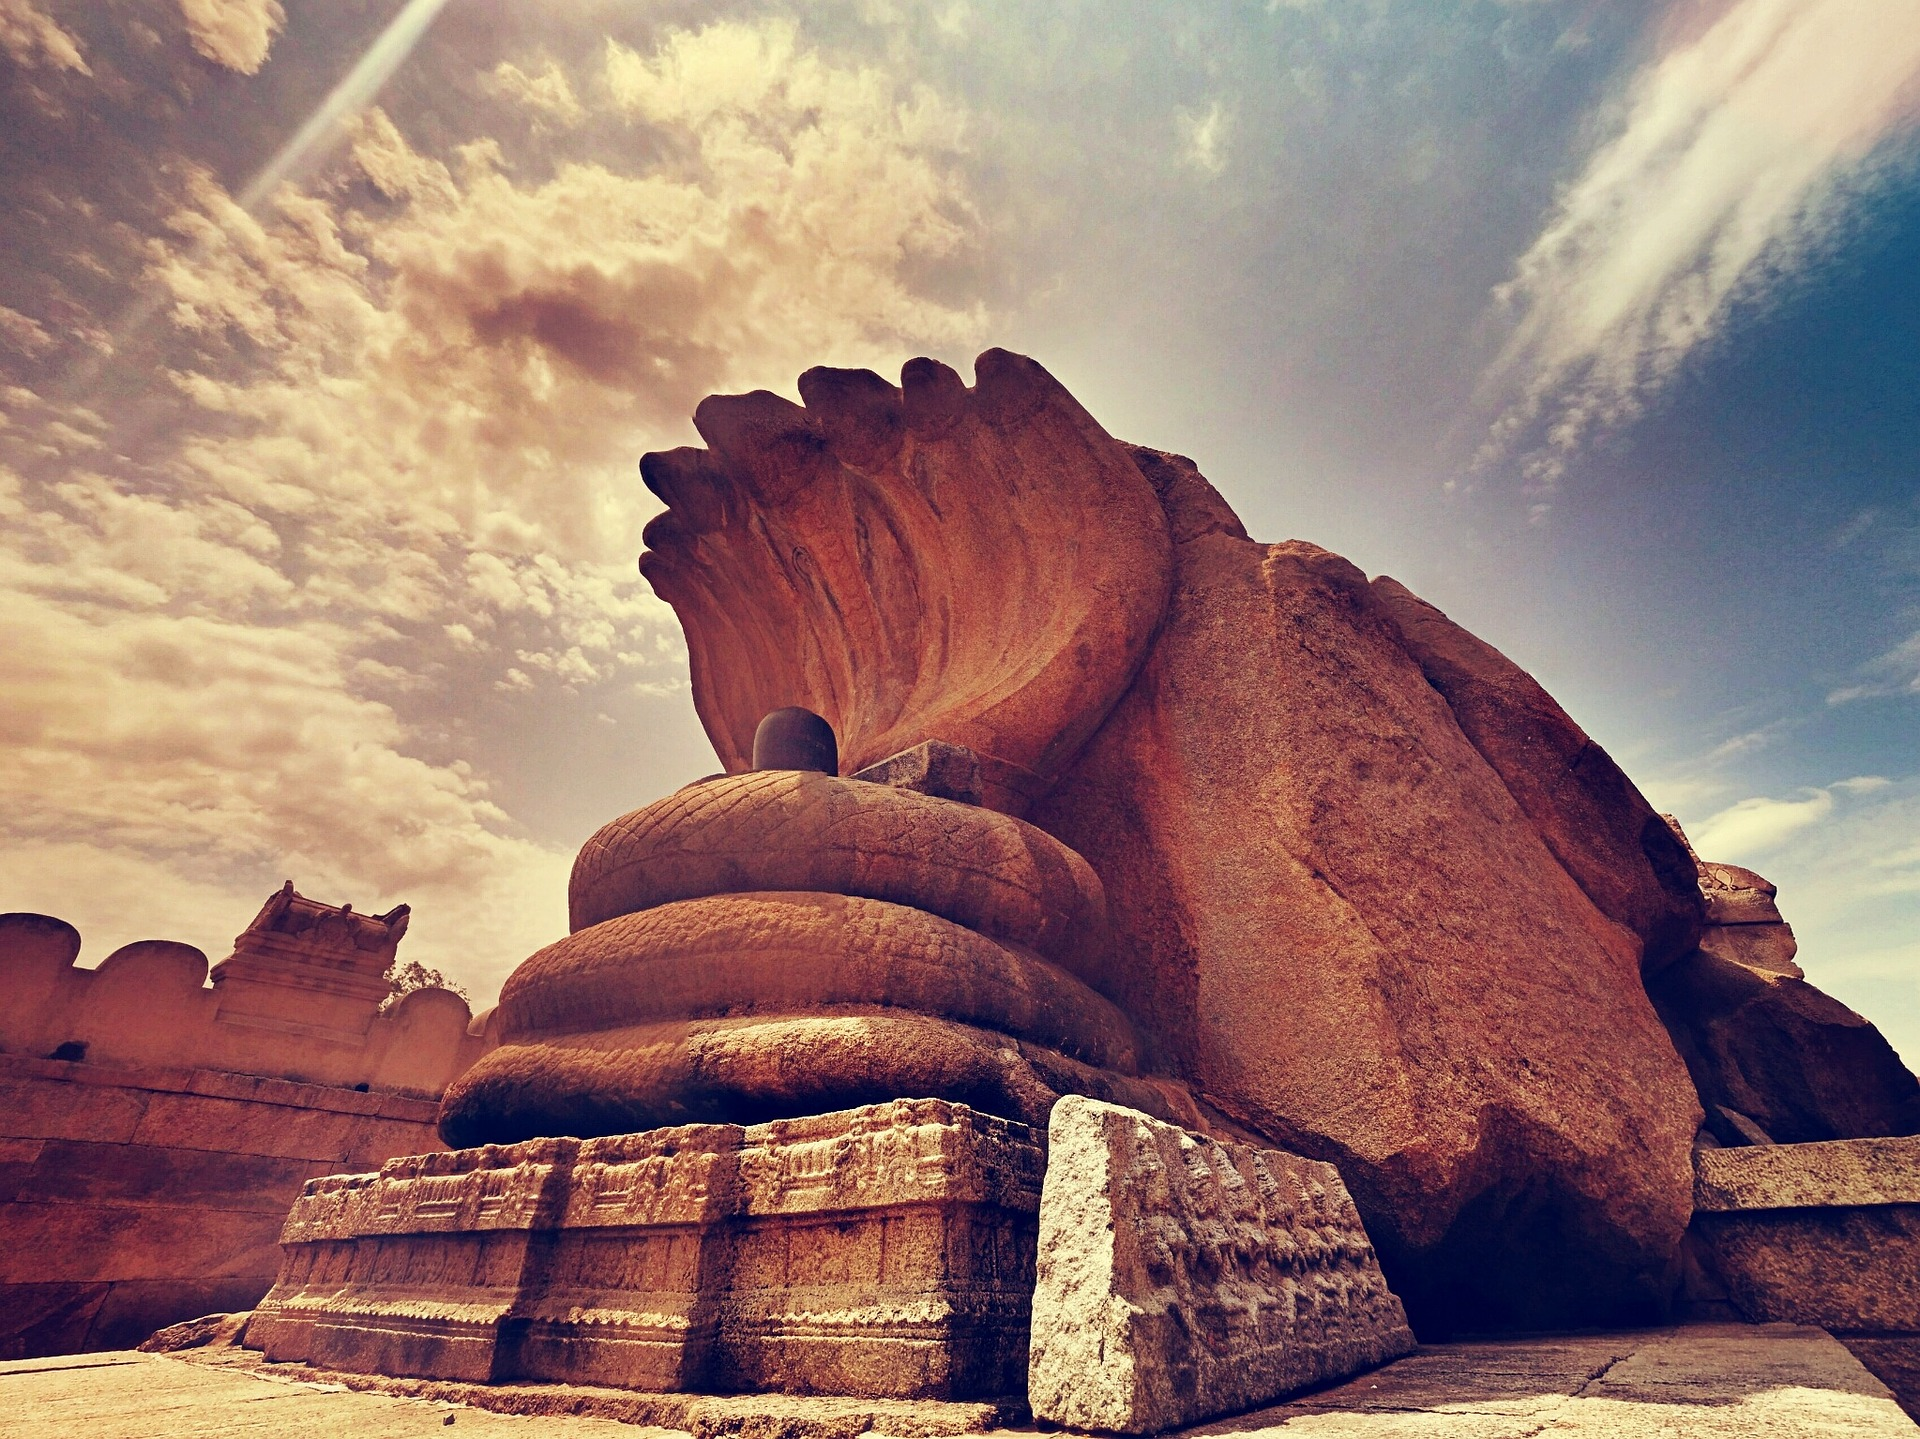 Kalyandurg